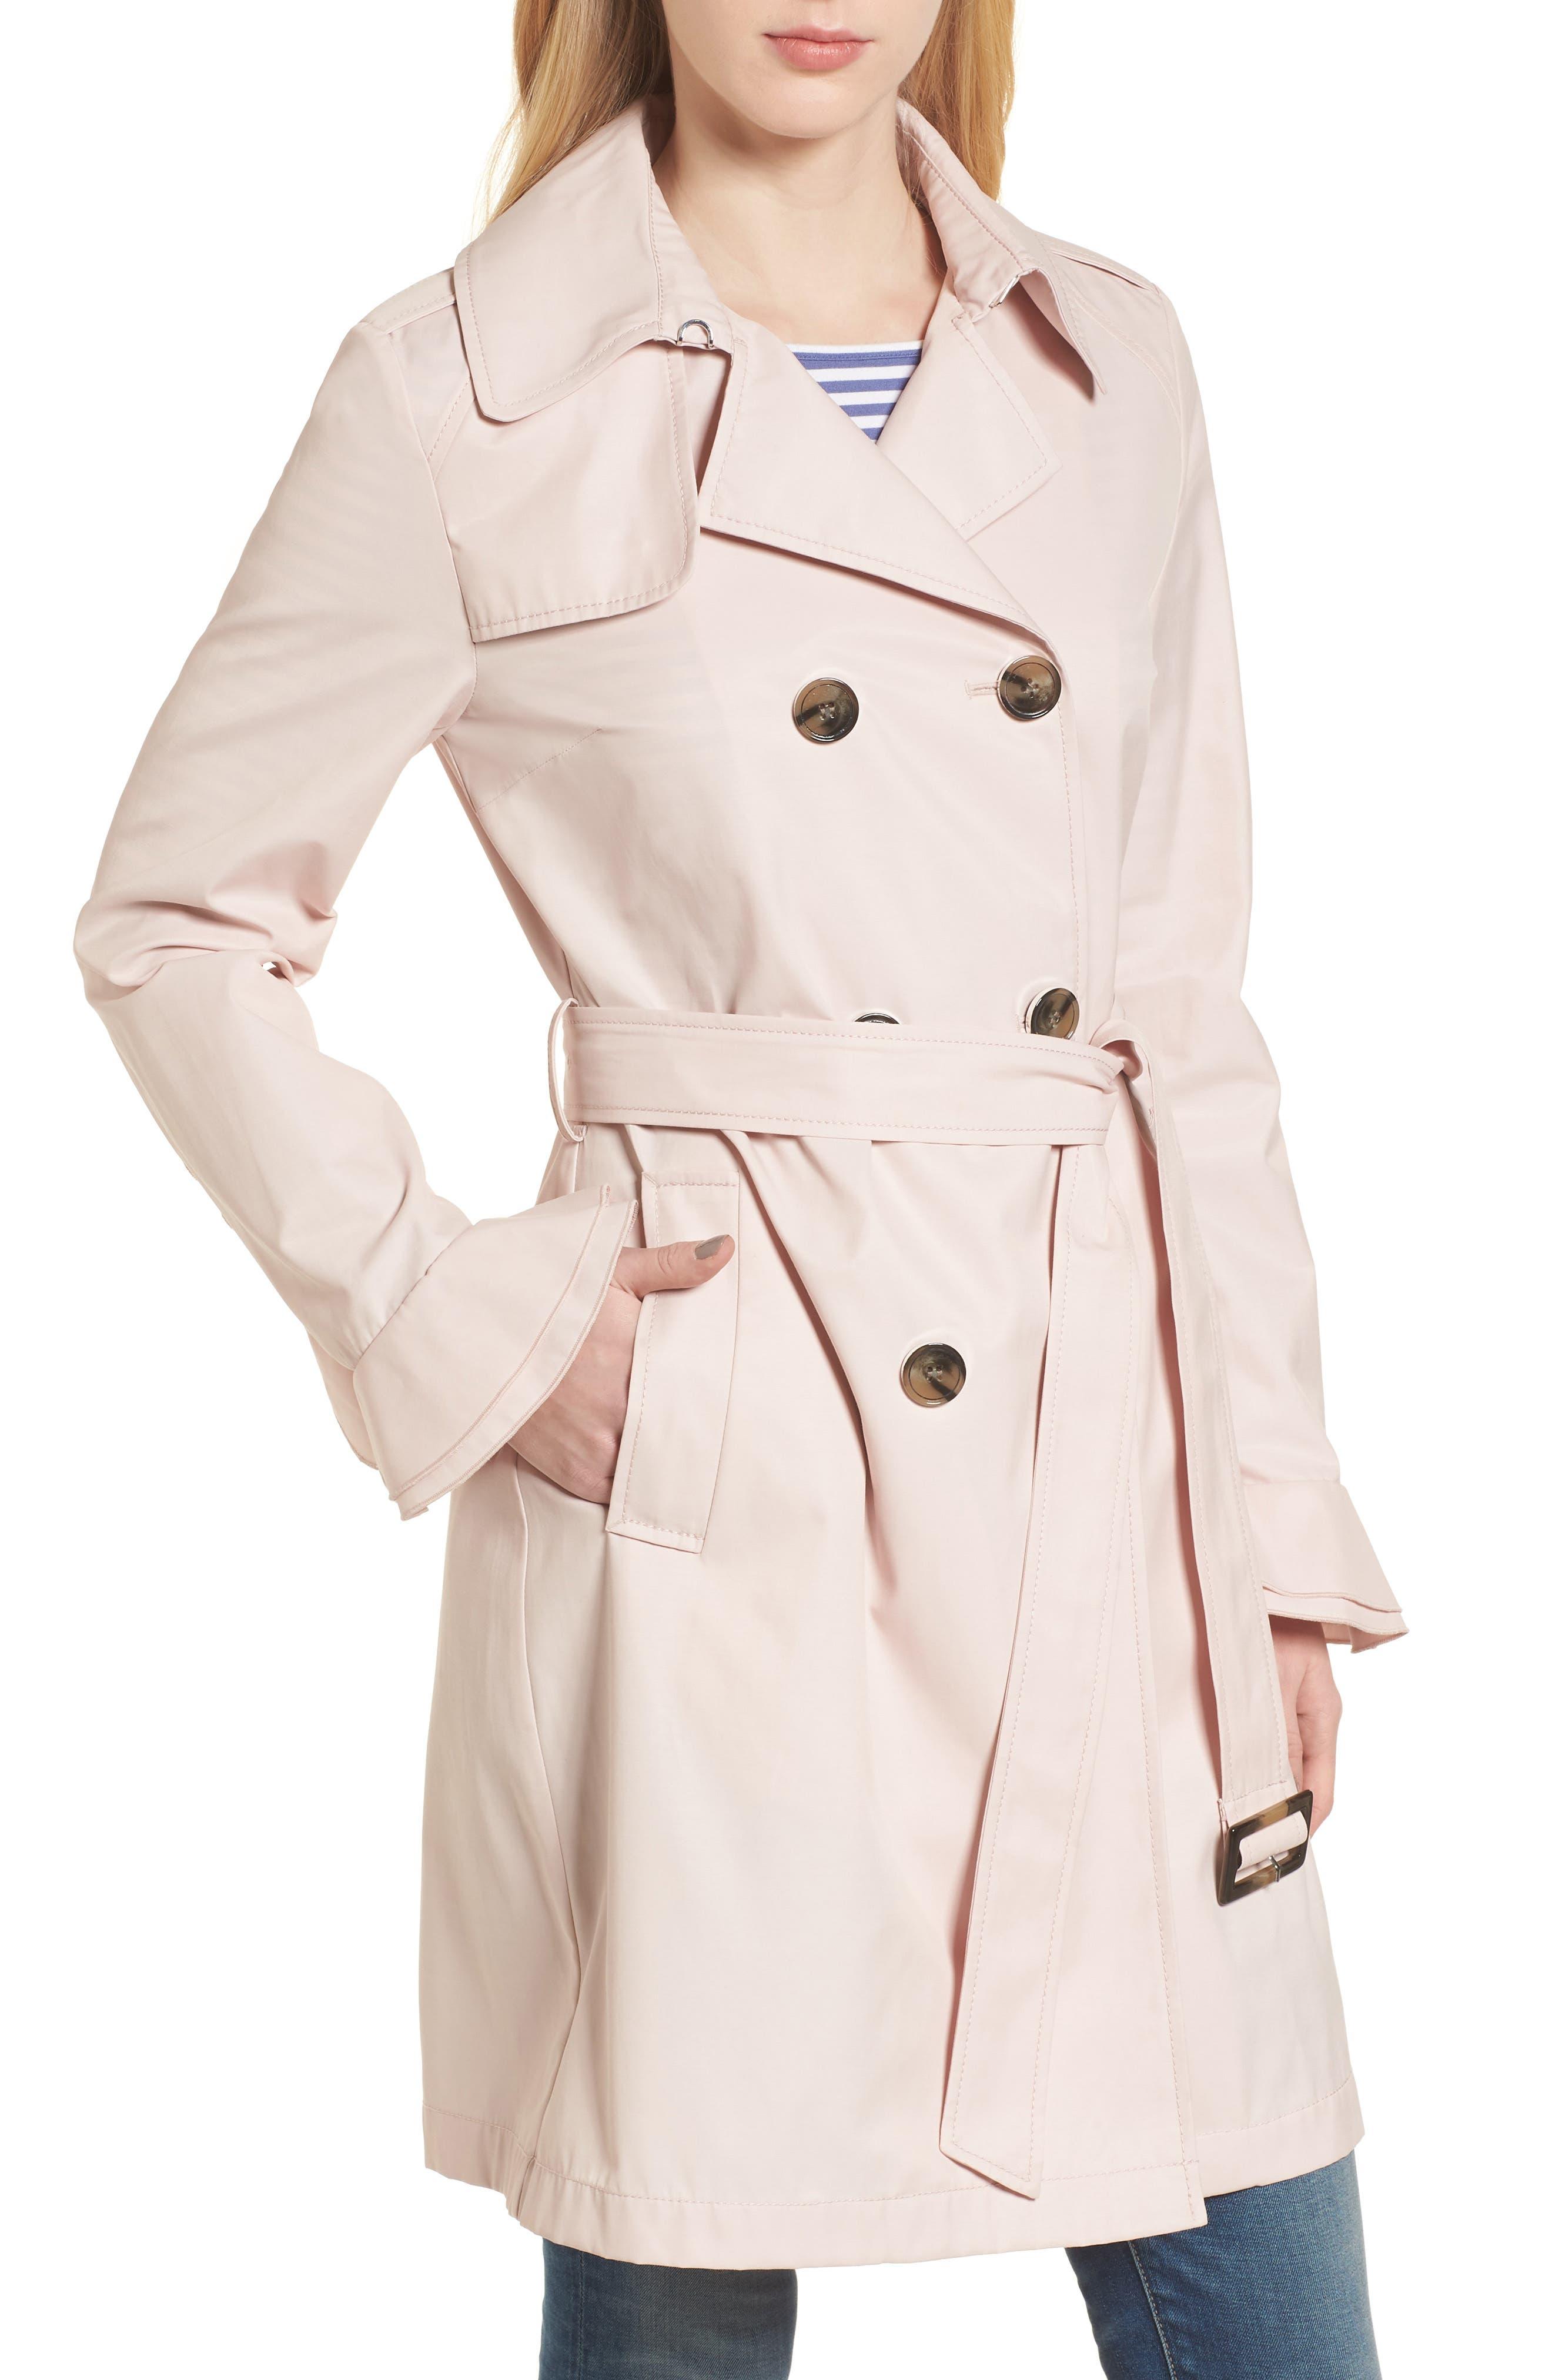 Stella Ruffle Sleeve Trench Coat,                             Main thumbnail 1, color,                             Dusty Pink